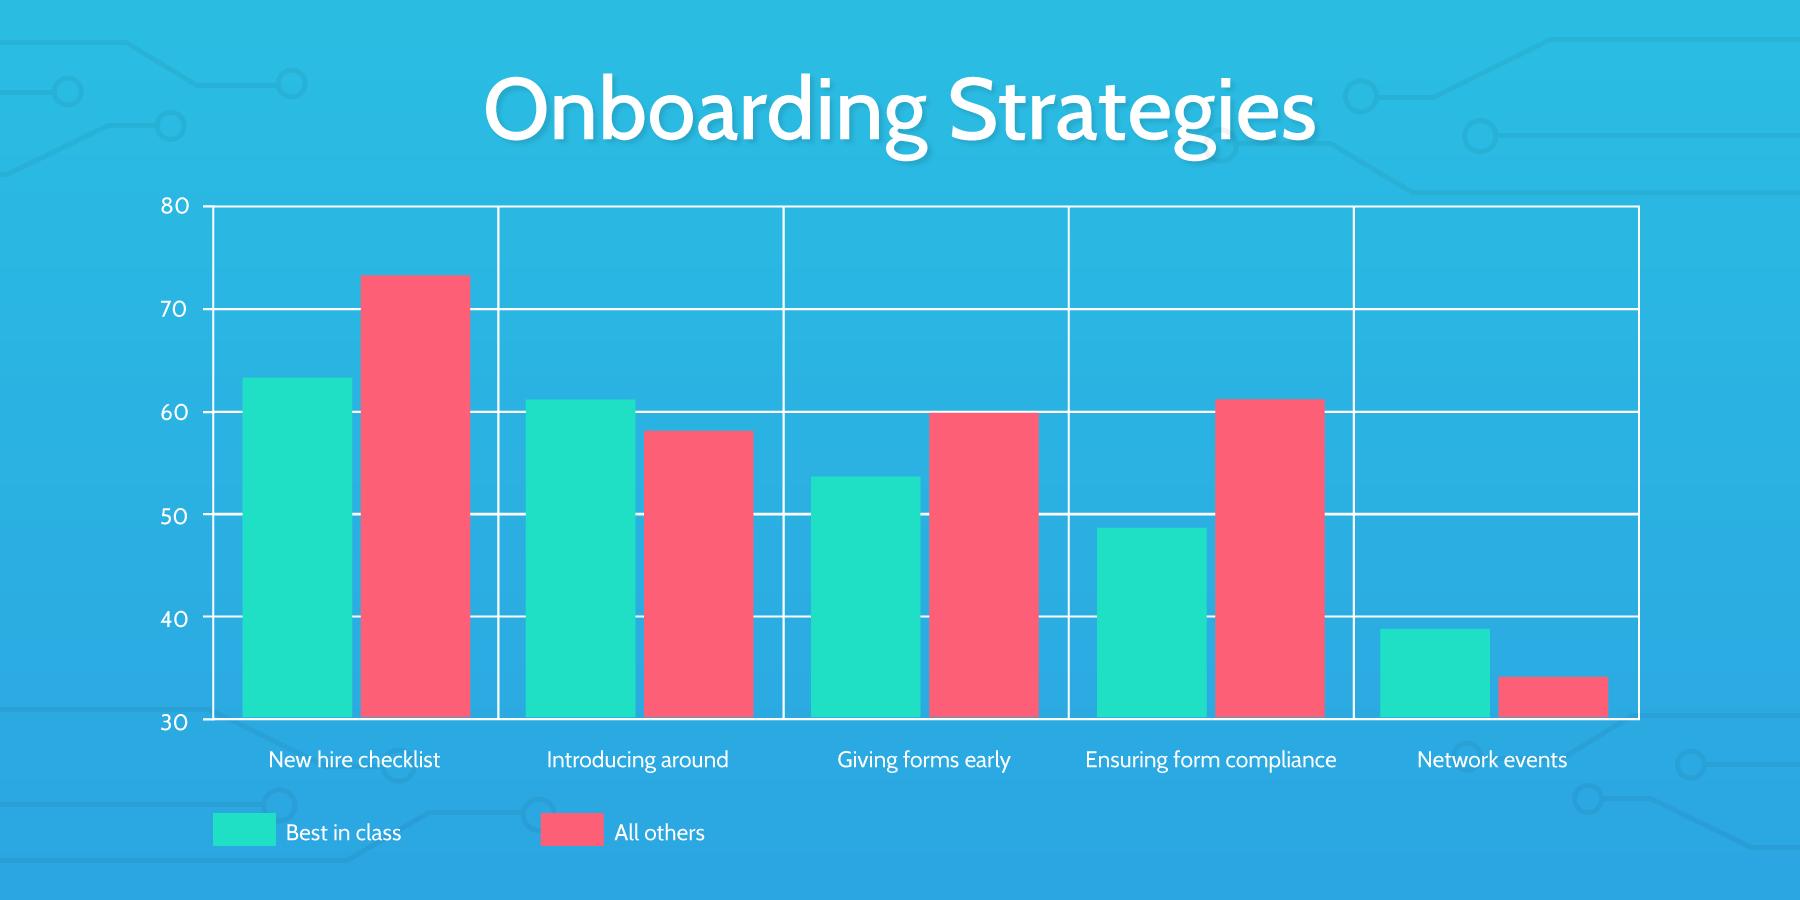 Employee Onboarding Strategies